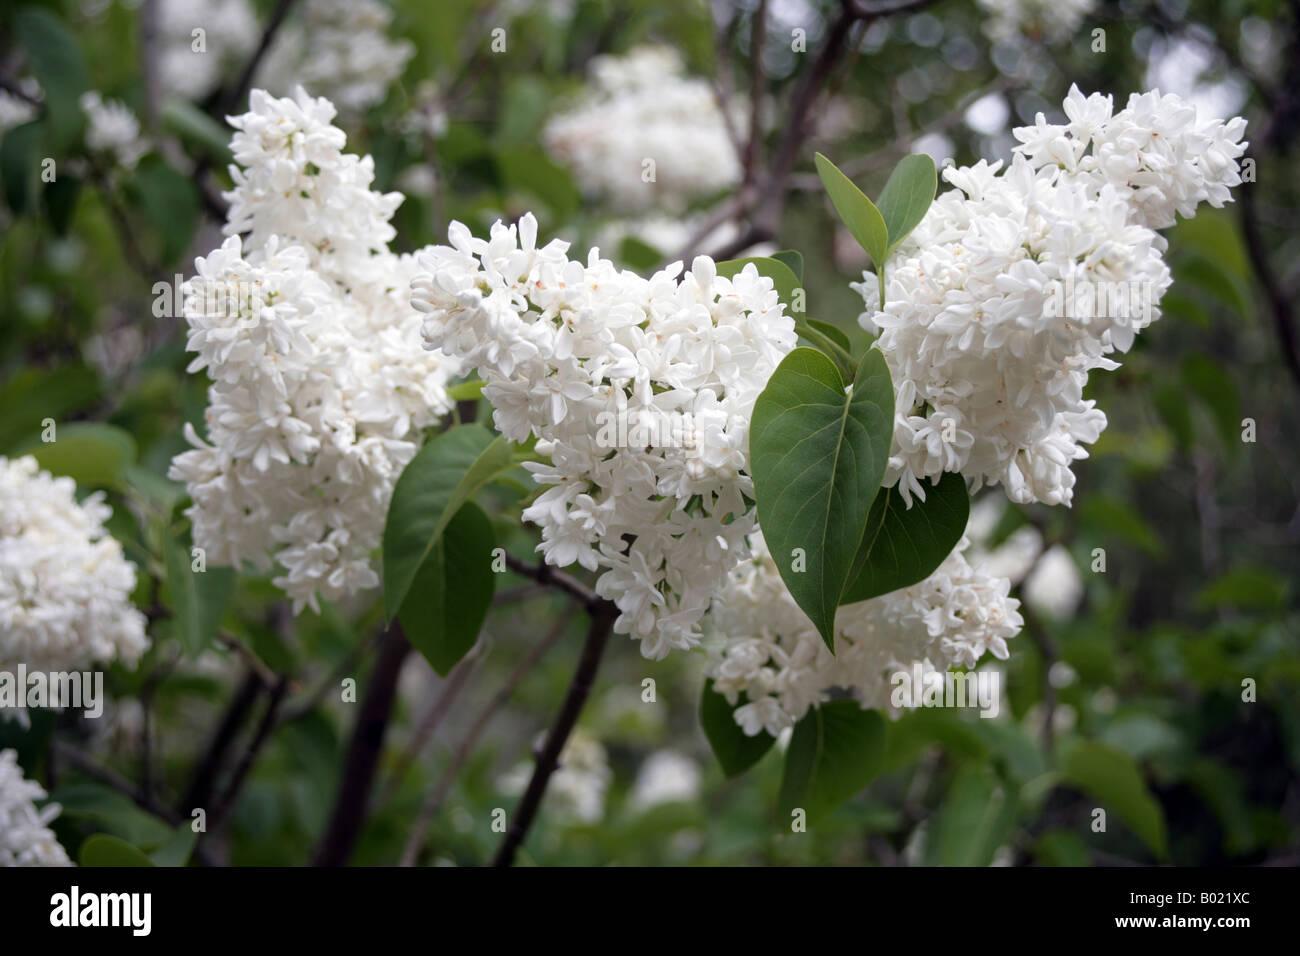 Syringa Mme Lemoine White Lilac Spring Flowering Tree In Botanical